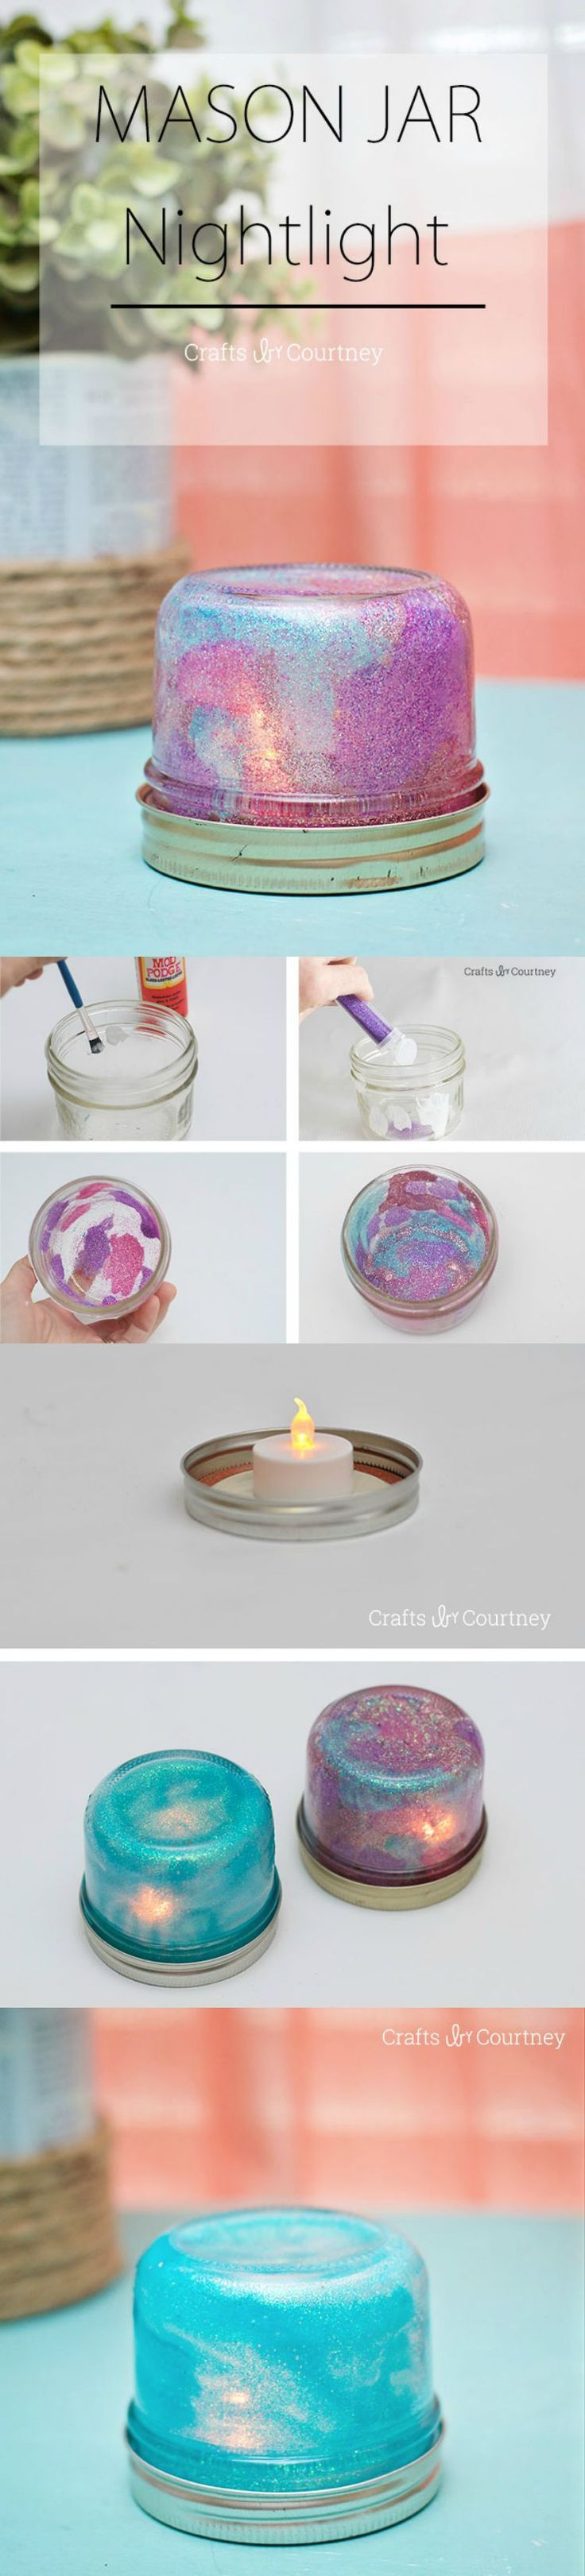 Mini light sets for crafts - Diy Mason Jar Night Light Craft